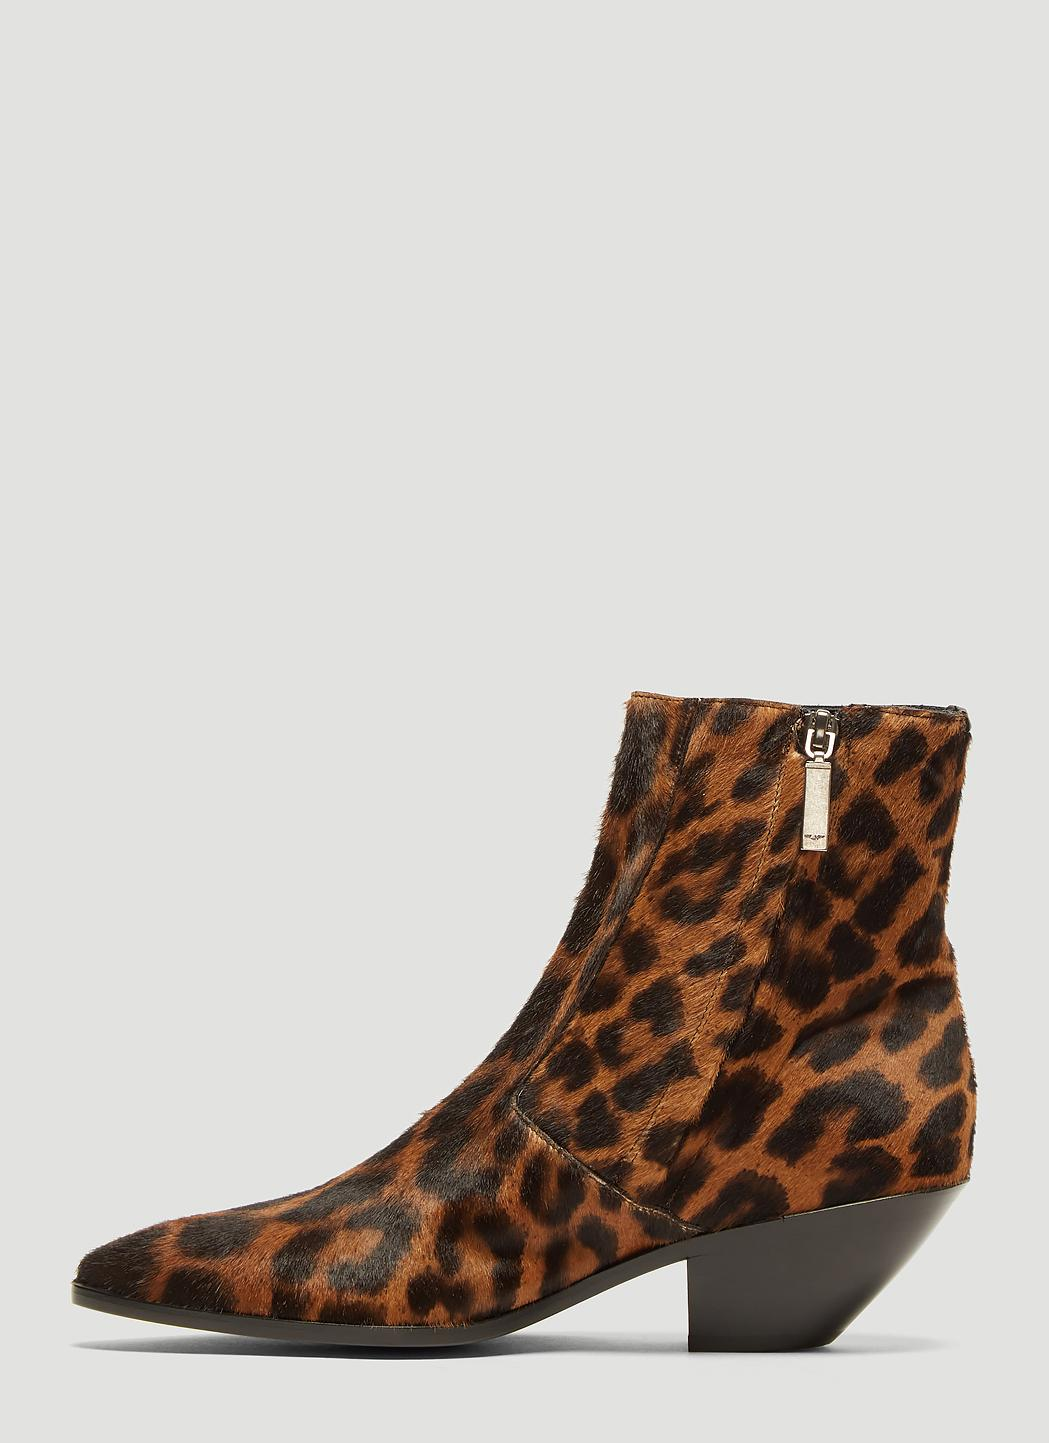 69519c93 saint-laurent-leopard-West-Leopard-print-Calf-hair-Boots-In-Brown.jpeg